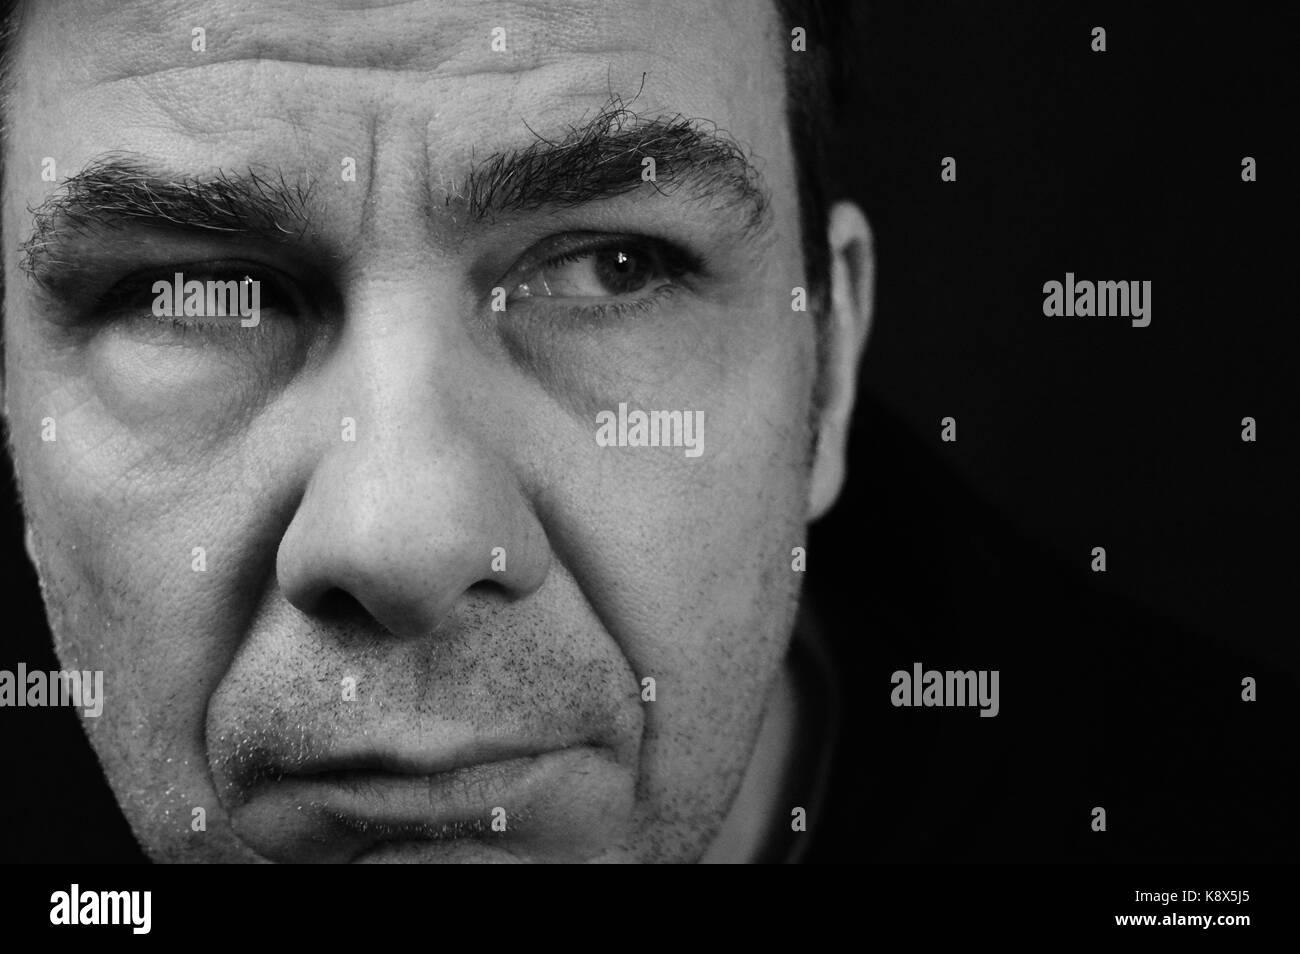 Man suffering depression - Stock Image